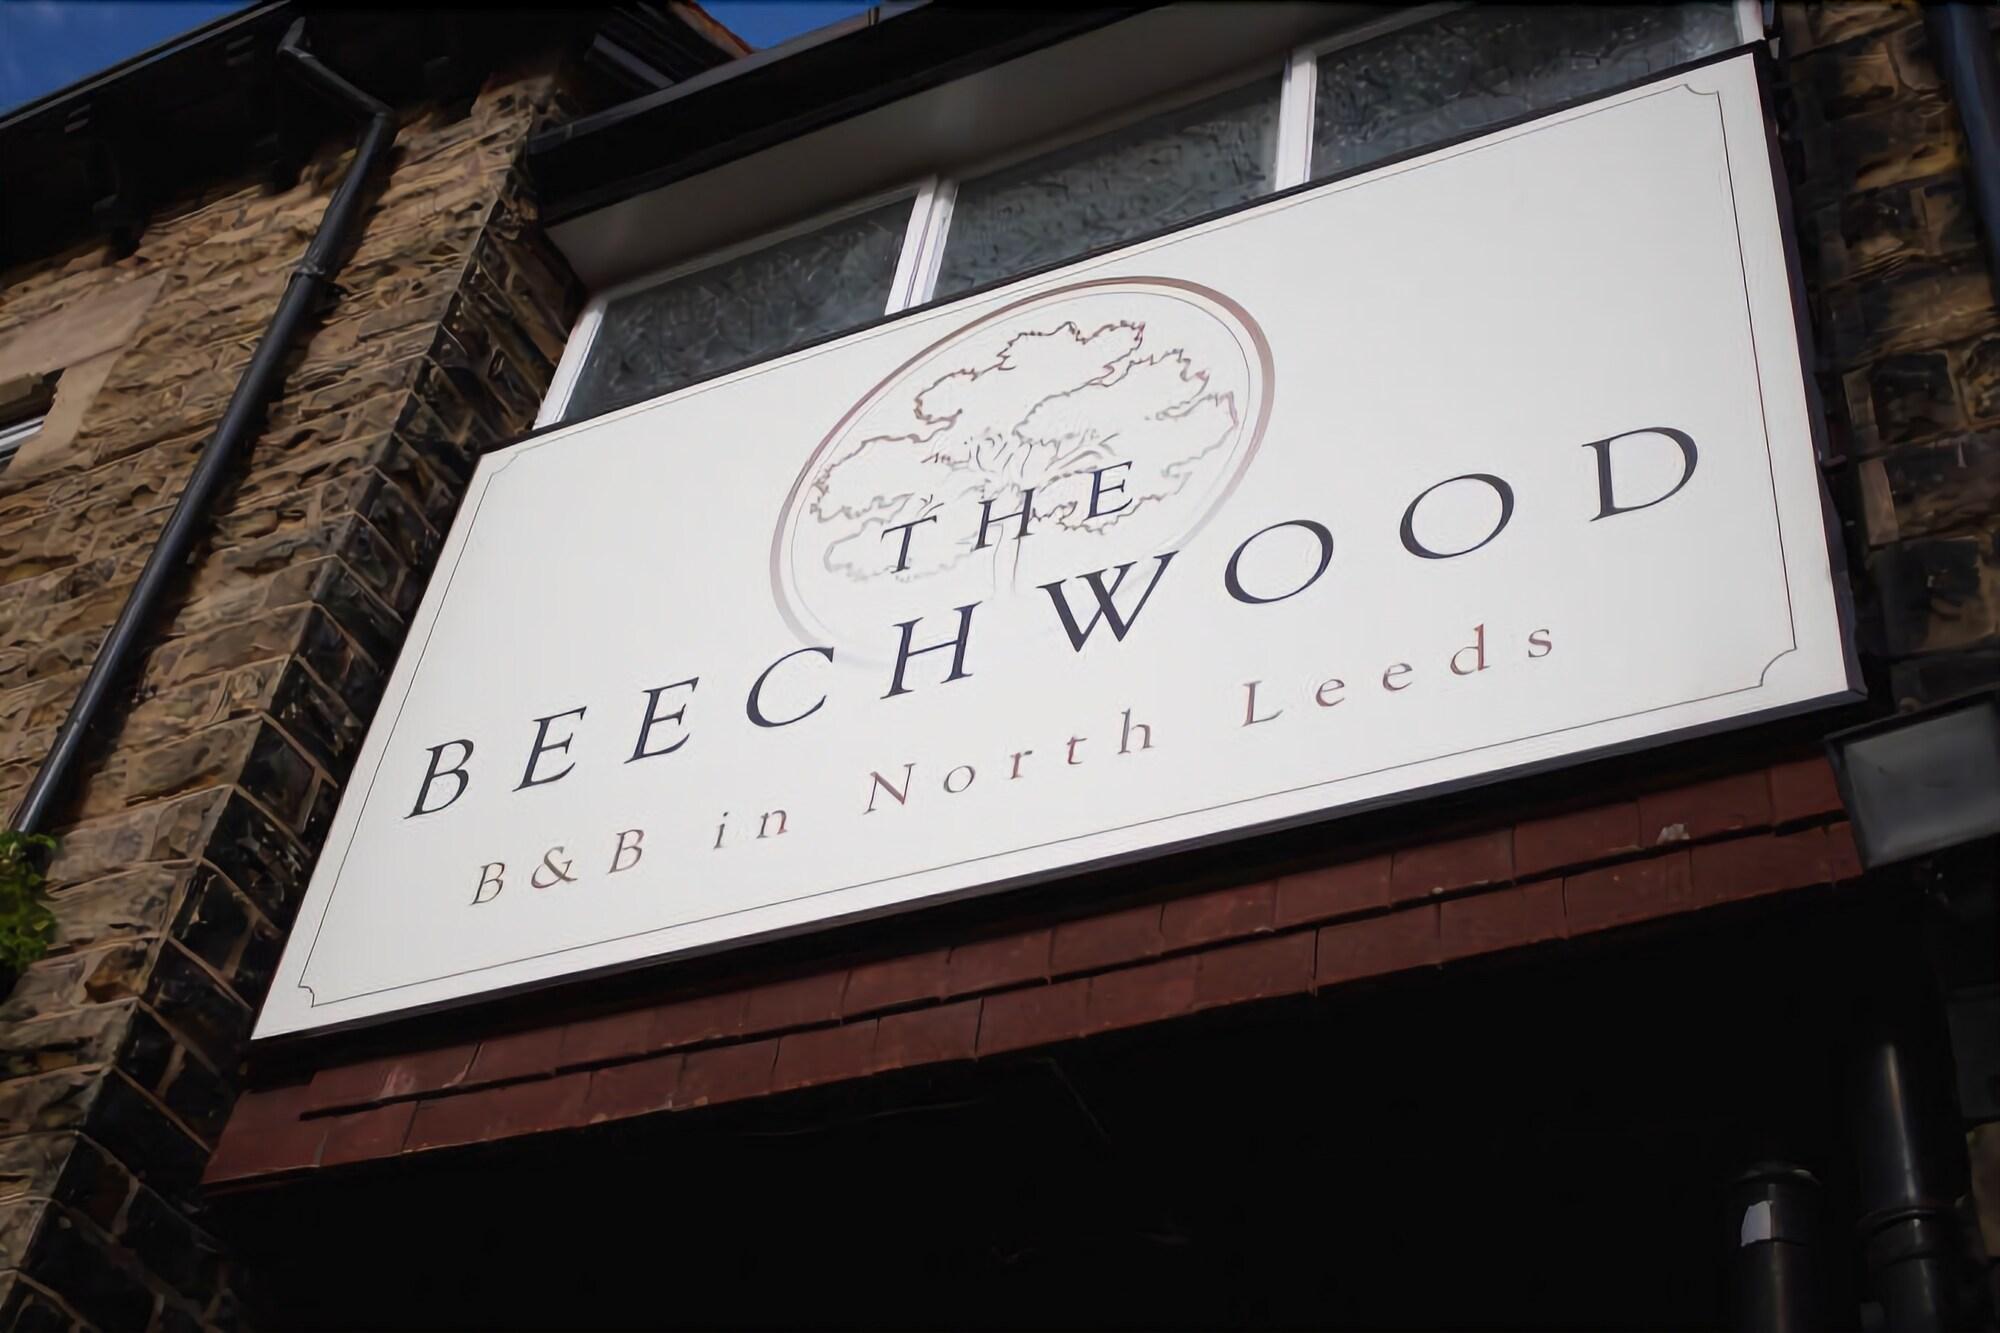 Beechwood B&B